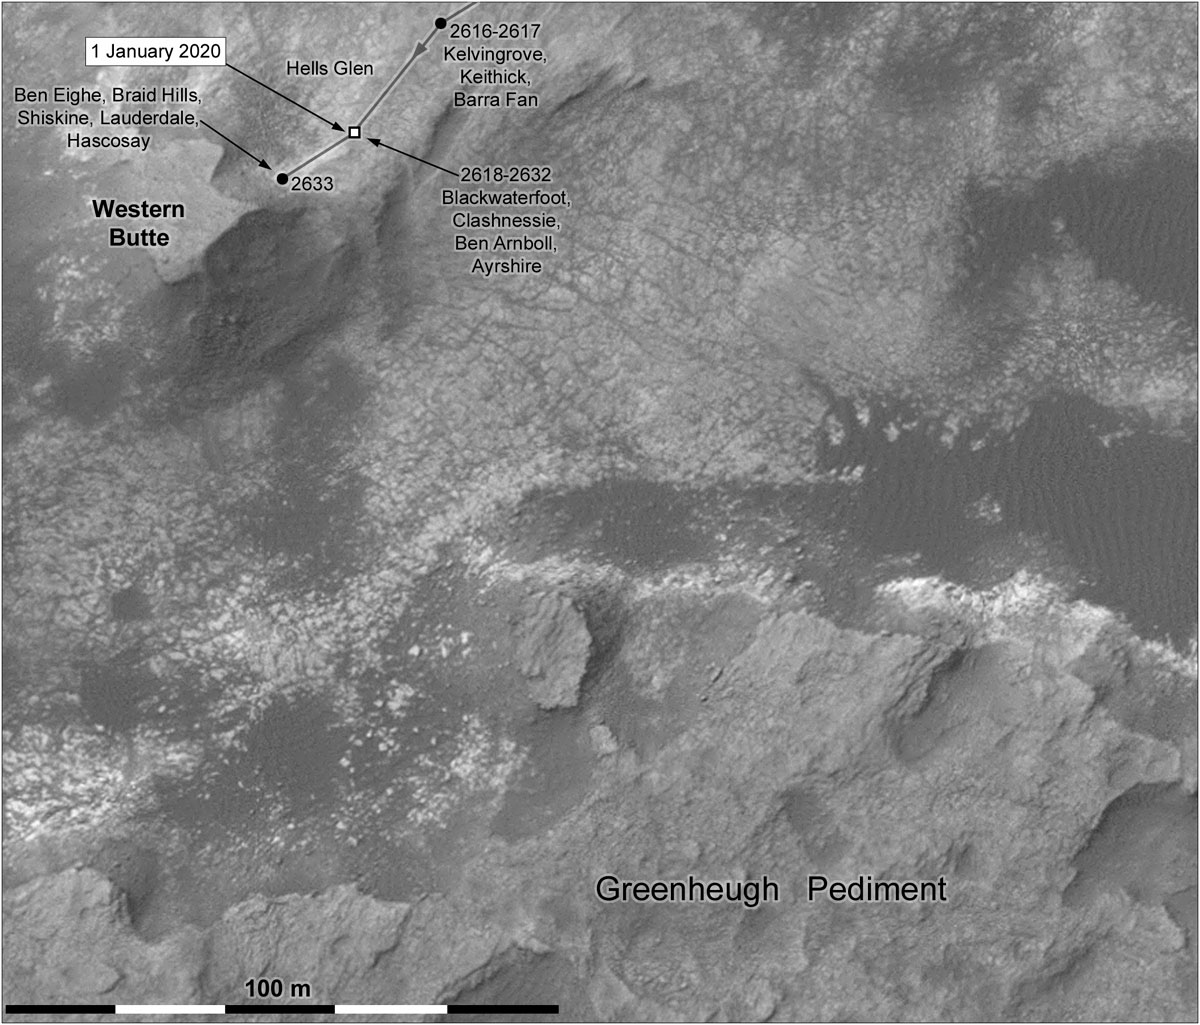 MARS: CURIOSITY u krateru  GALE Vol II. - Page 13 Index